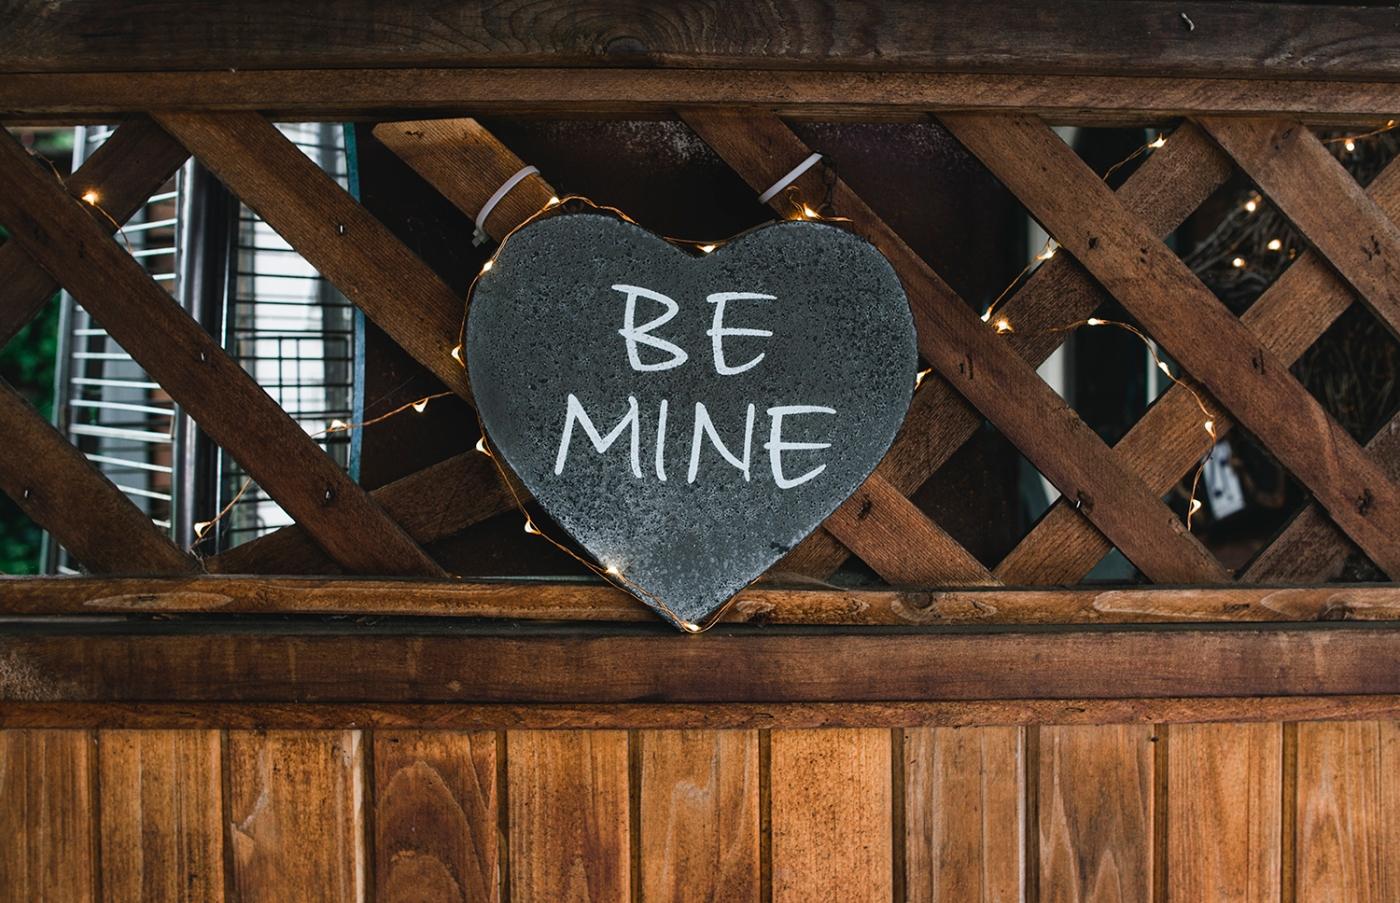 Jane_Speleers_2016_Details_Wedding_Wild_Rose_Estates_Venue_DSC_0201